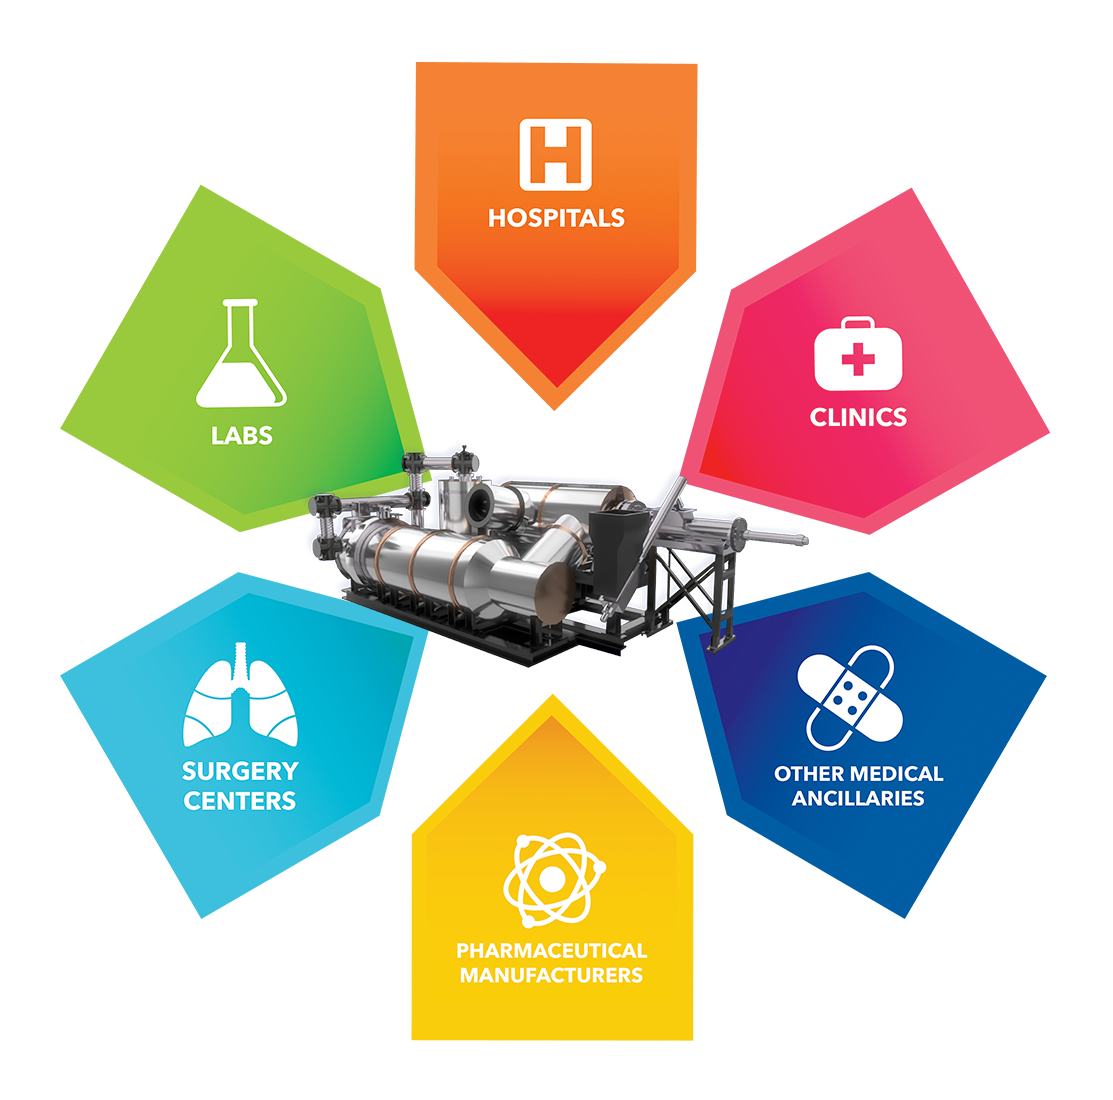 monarch waste technologies llc solution for central destruction facility for medical waste illustration diagram